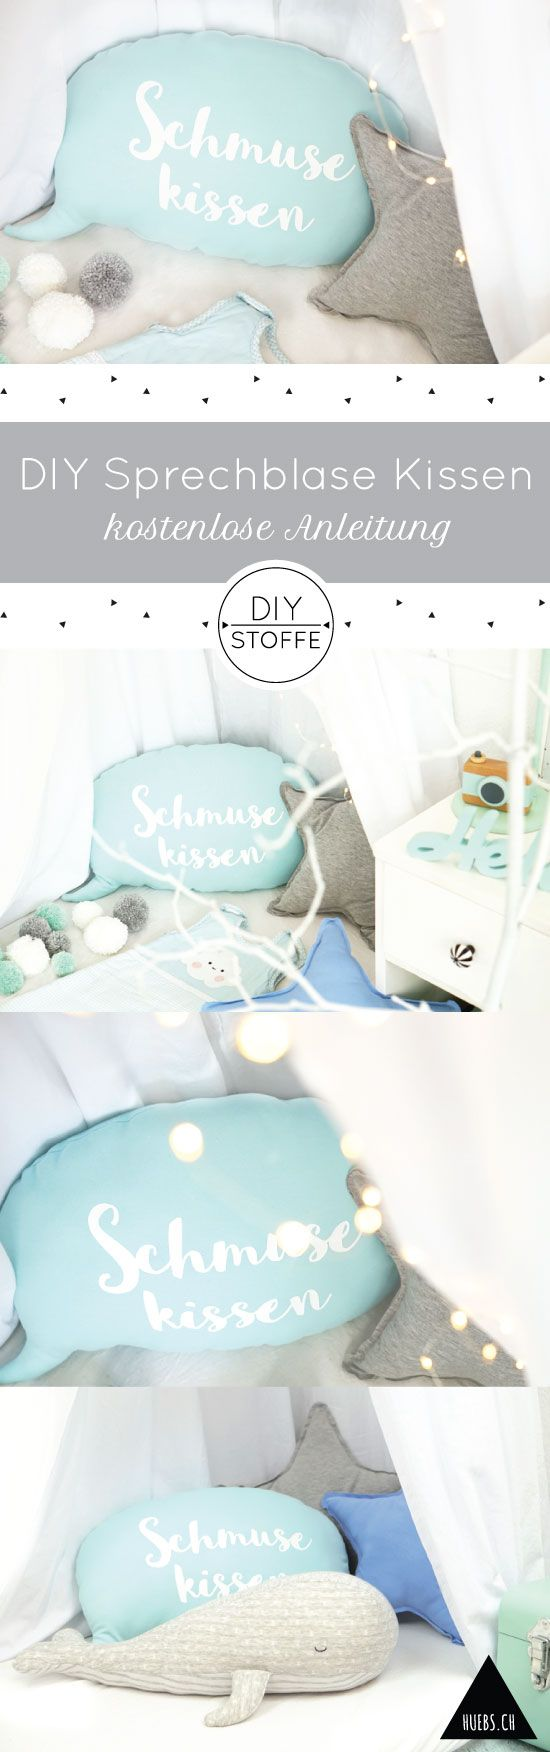 30 best DIY - Nähen Kissen images on Pinterest | Kissen, Diy nähen ...